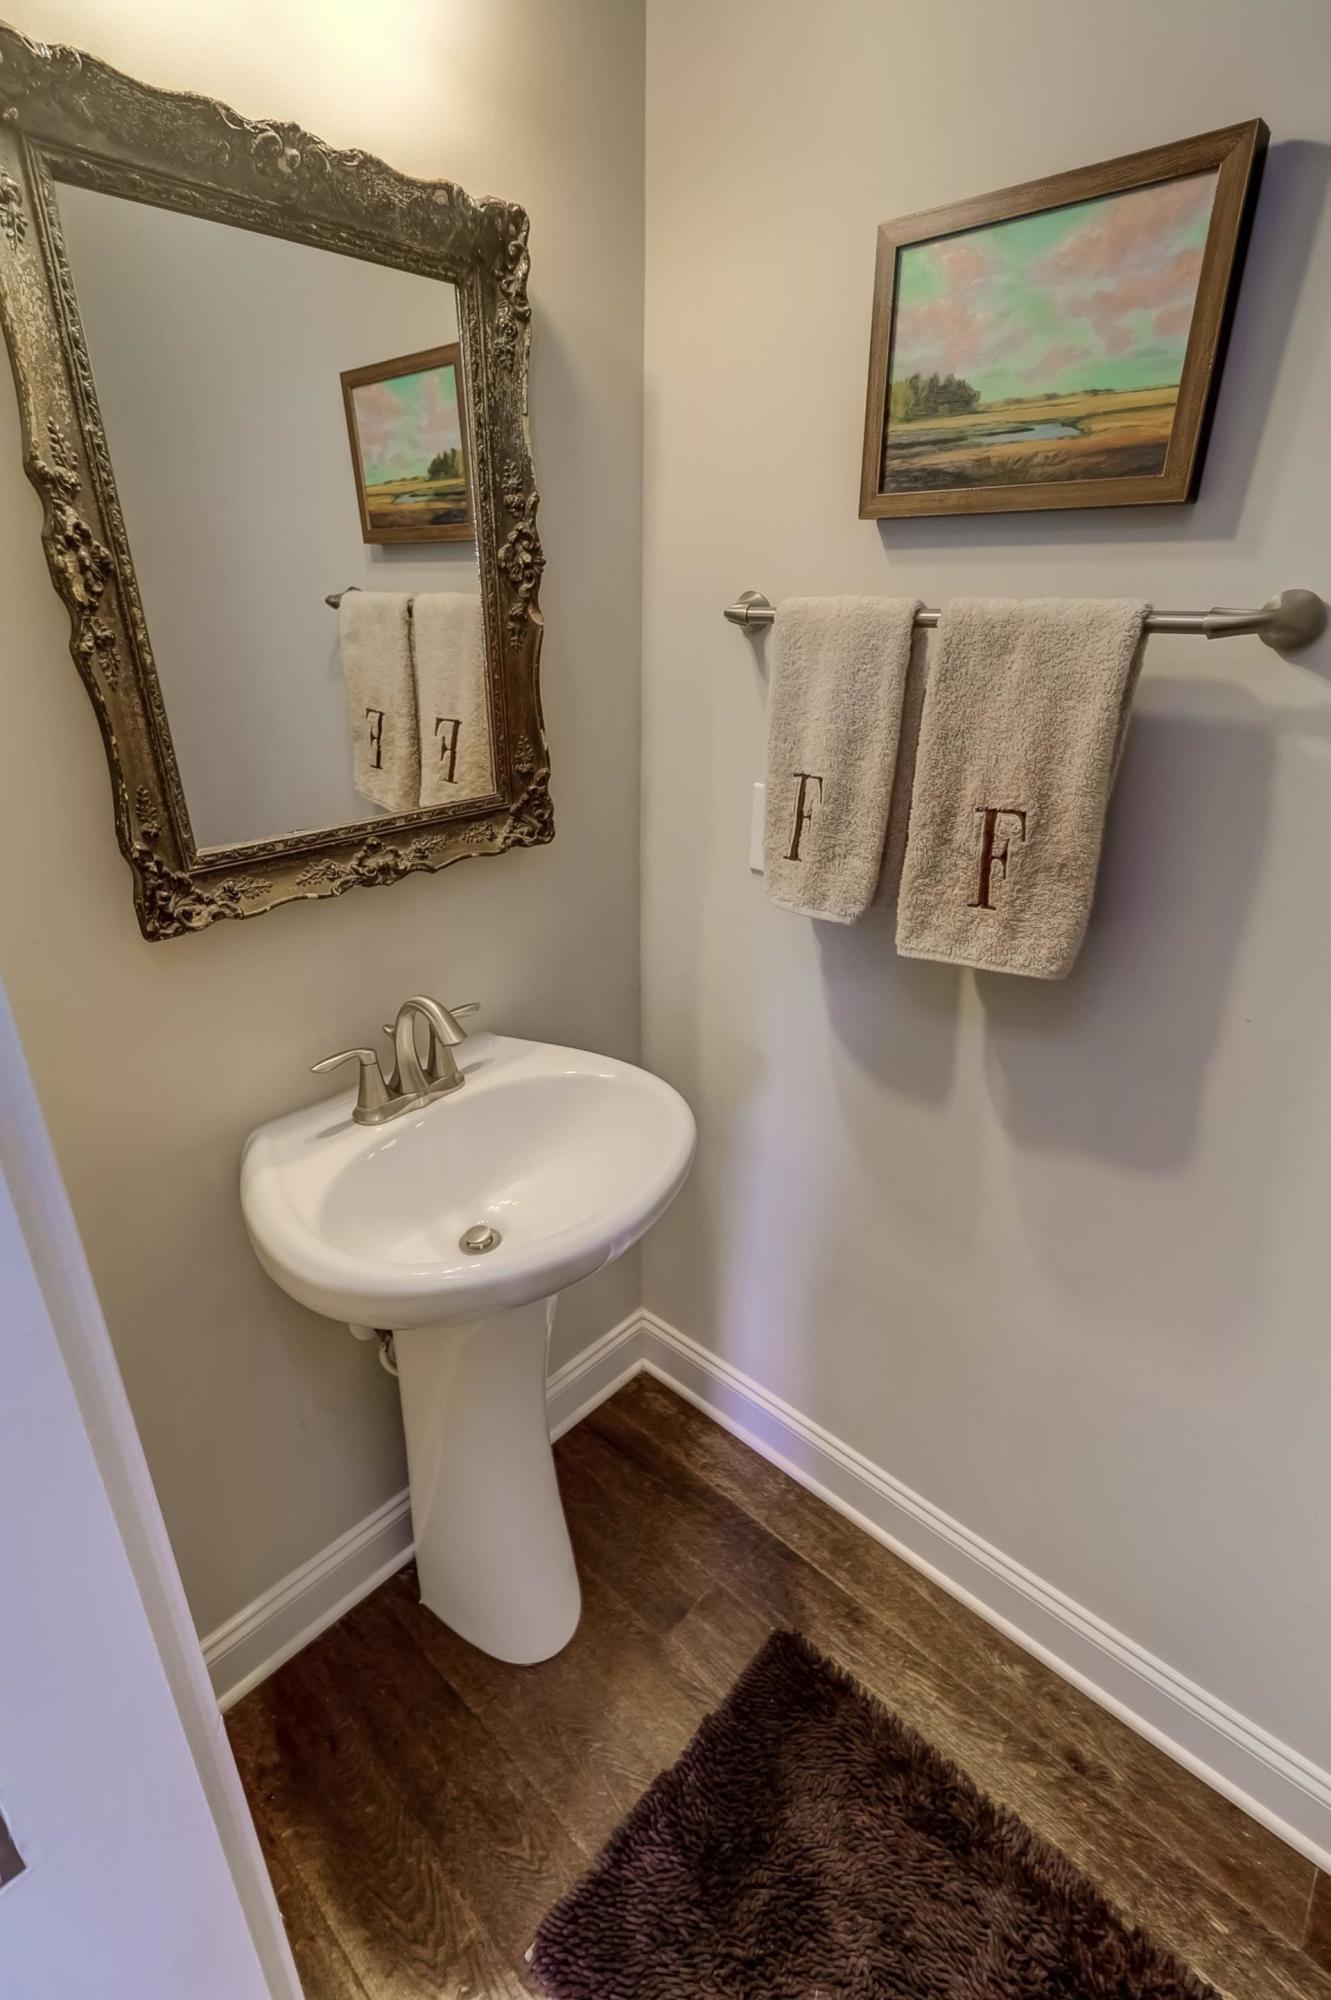 Etiwan Pointe Homes For Sale - 220 Slipper Shell, Mount Pleasant, SC - 21